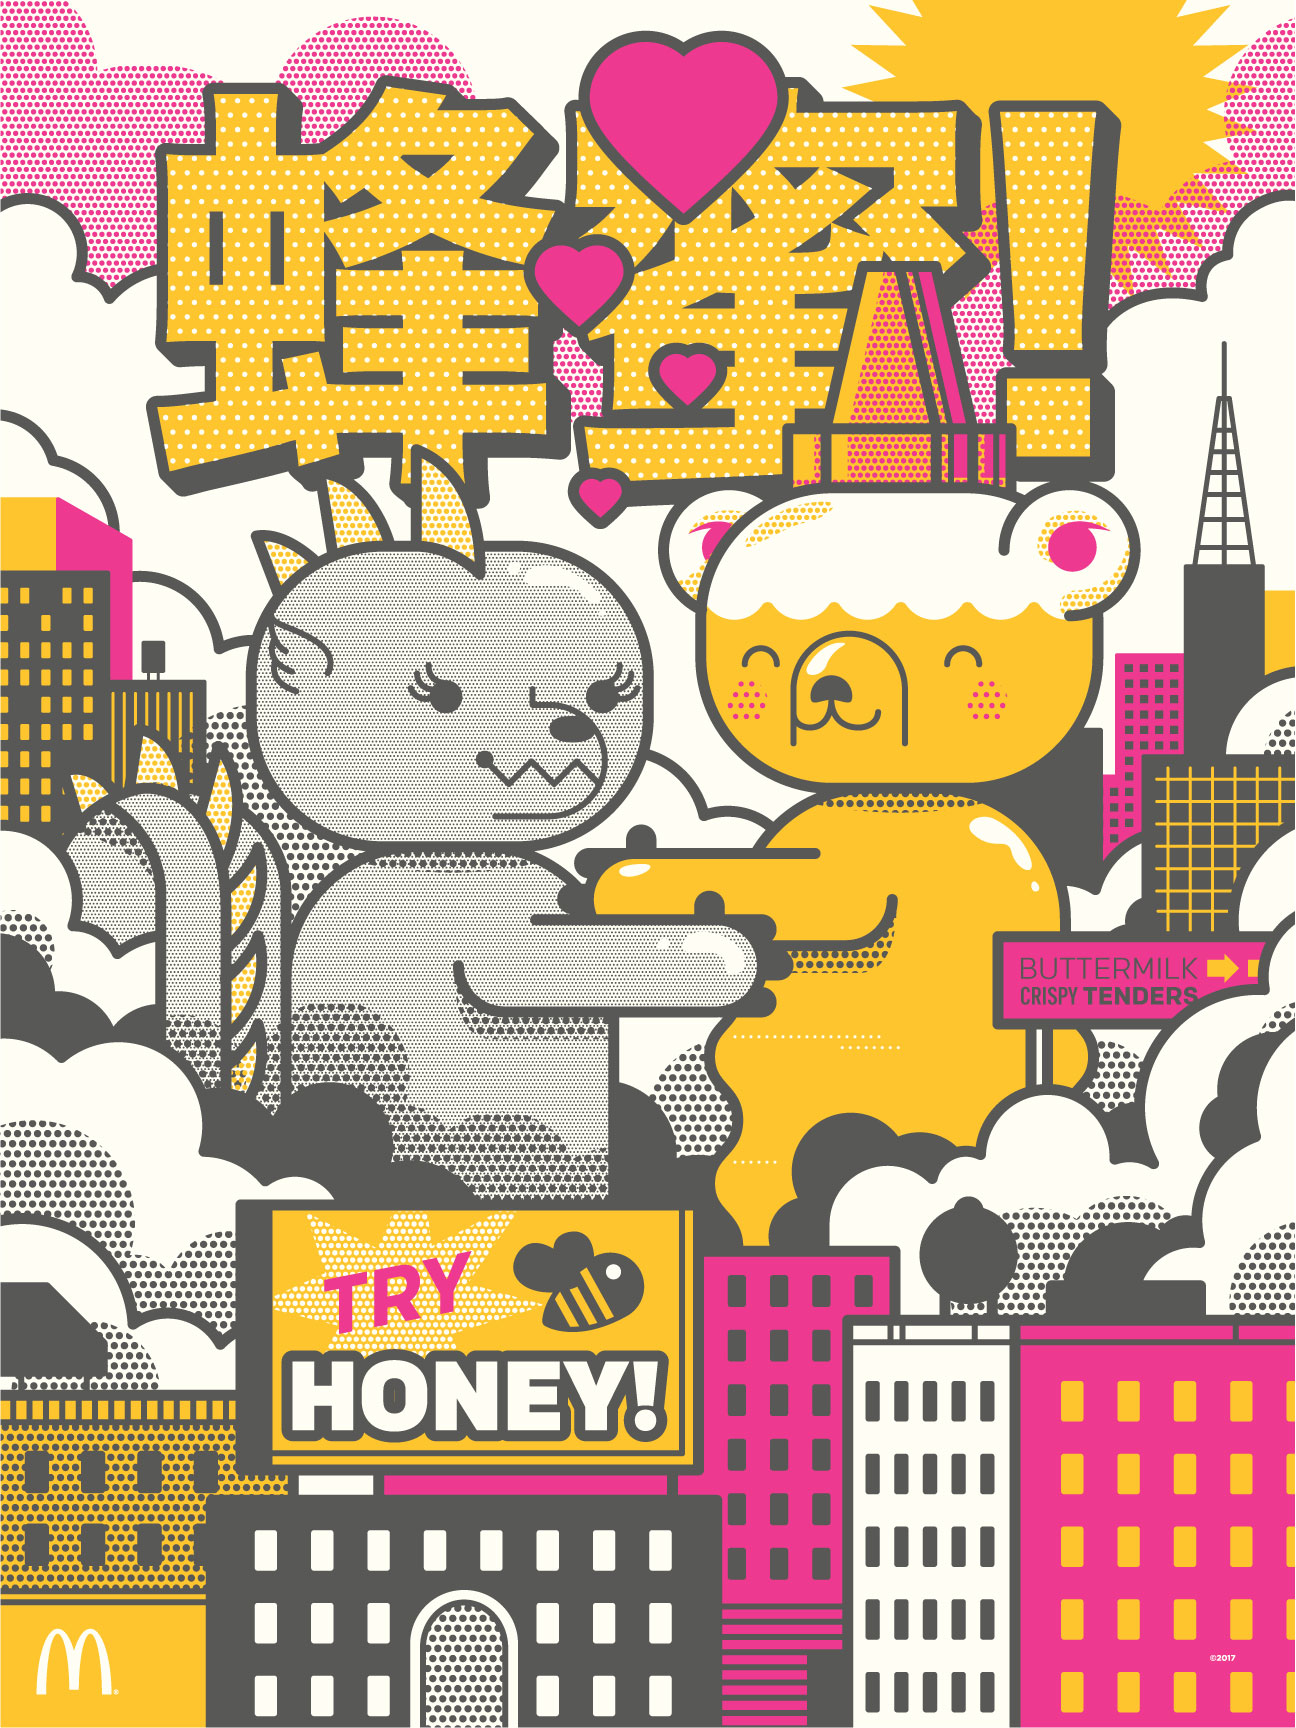 Honey_McDonalds.jpg